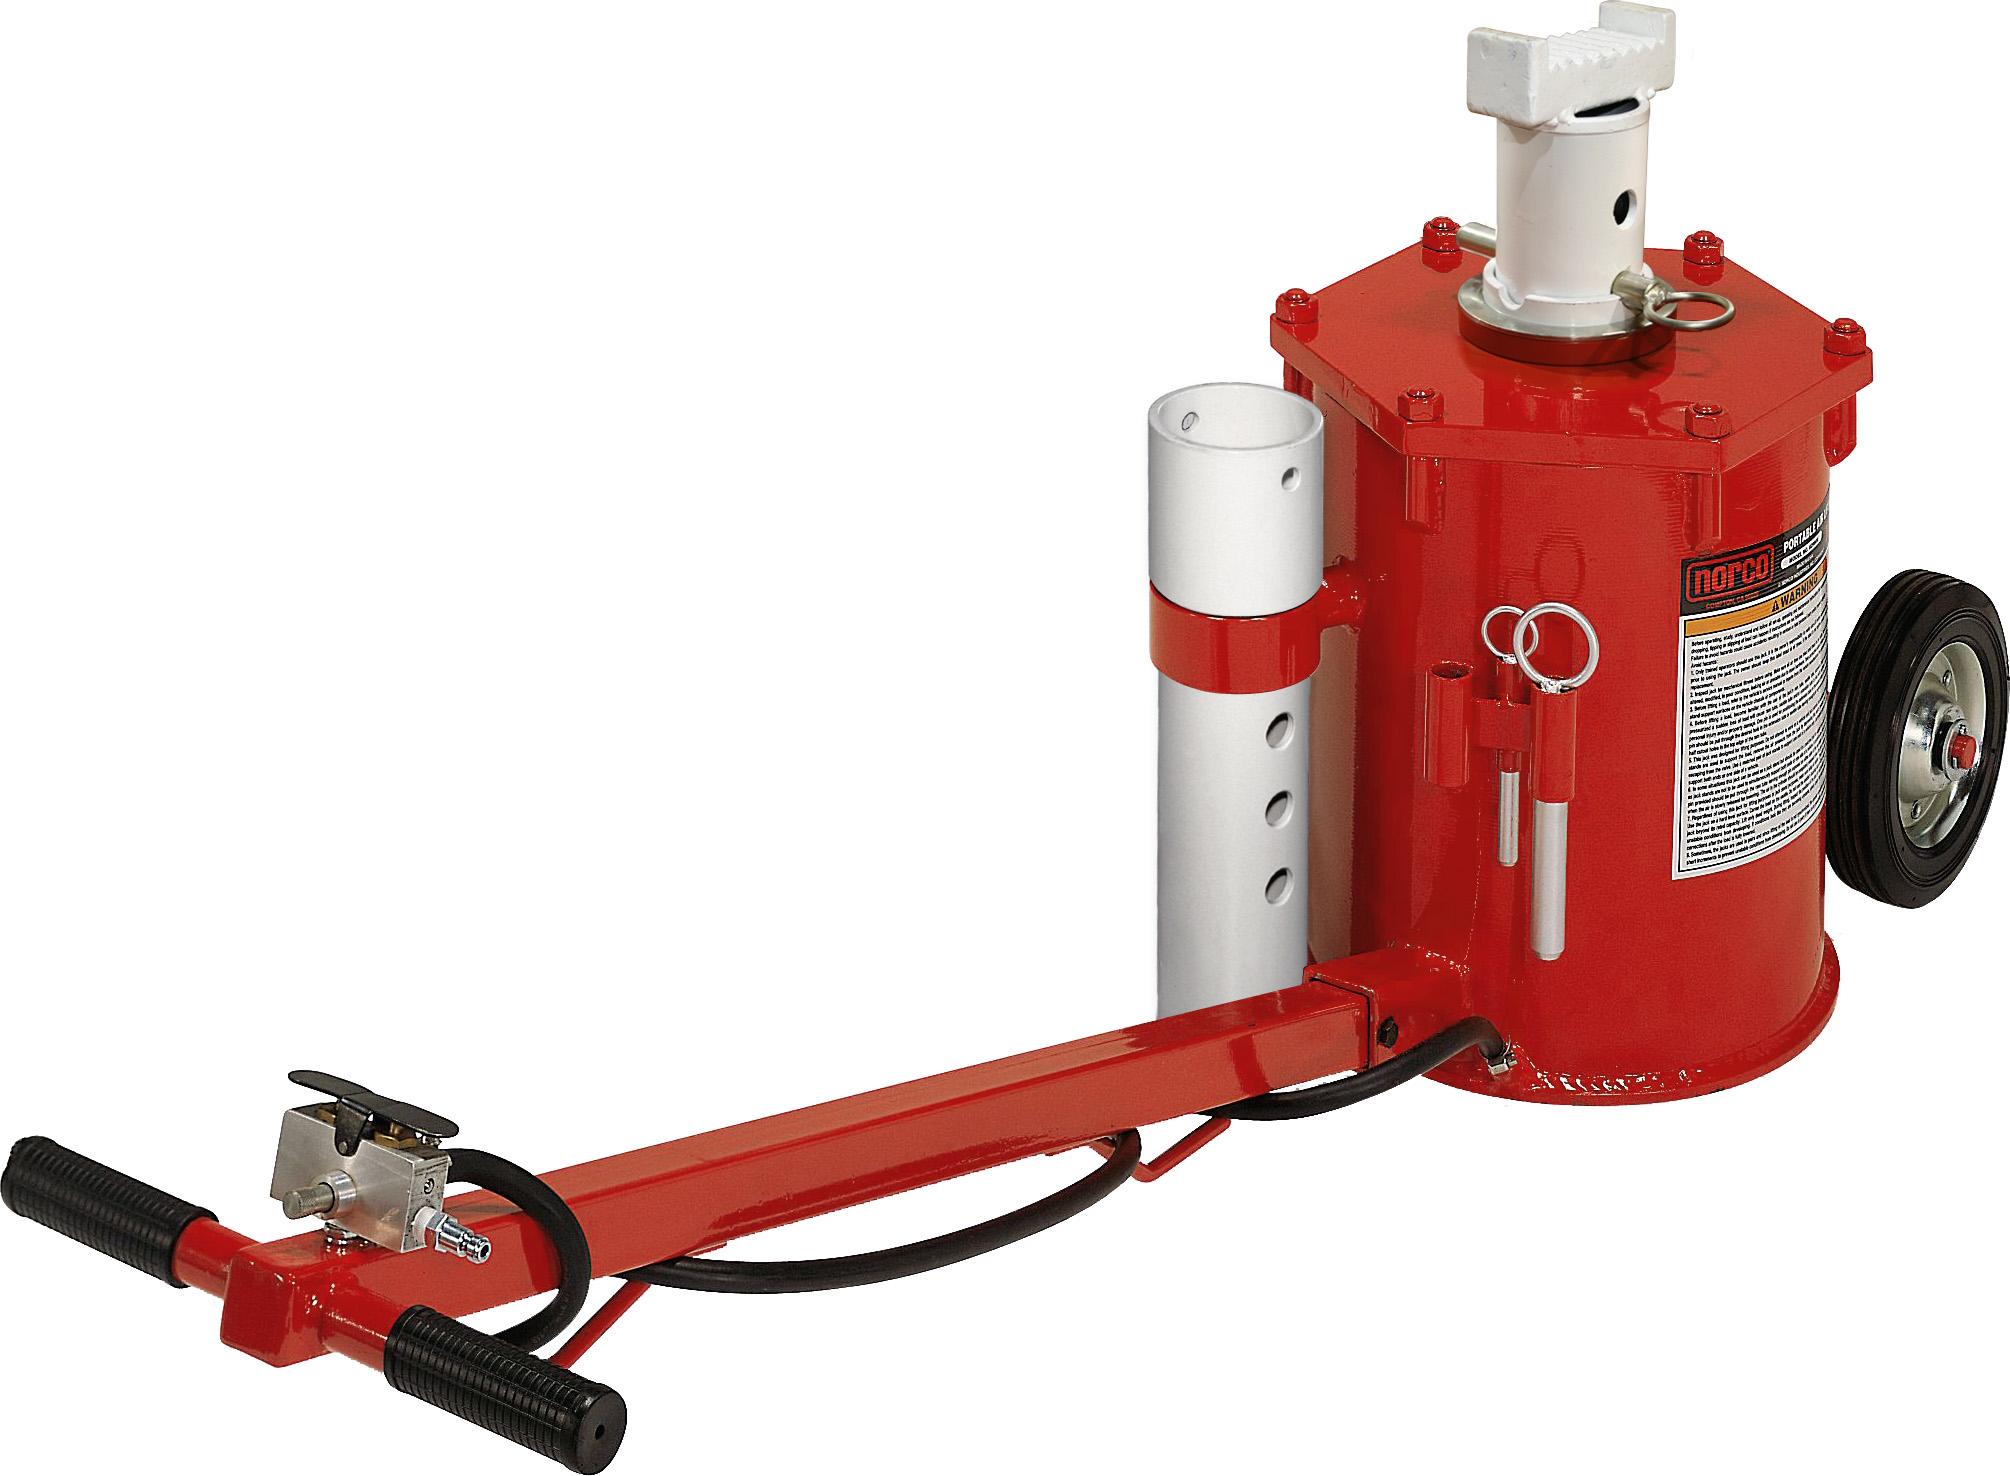 Norco 10 Ton Portable Air Lift Jack Free Shipping